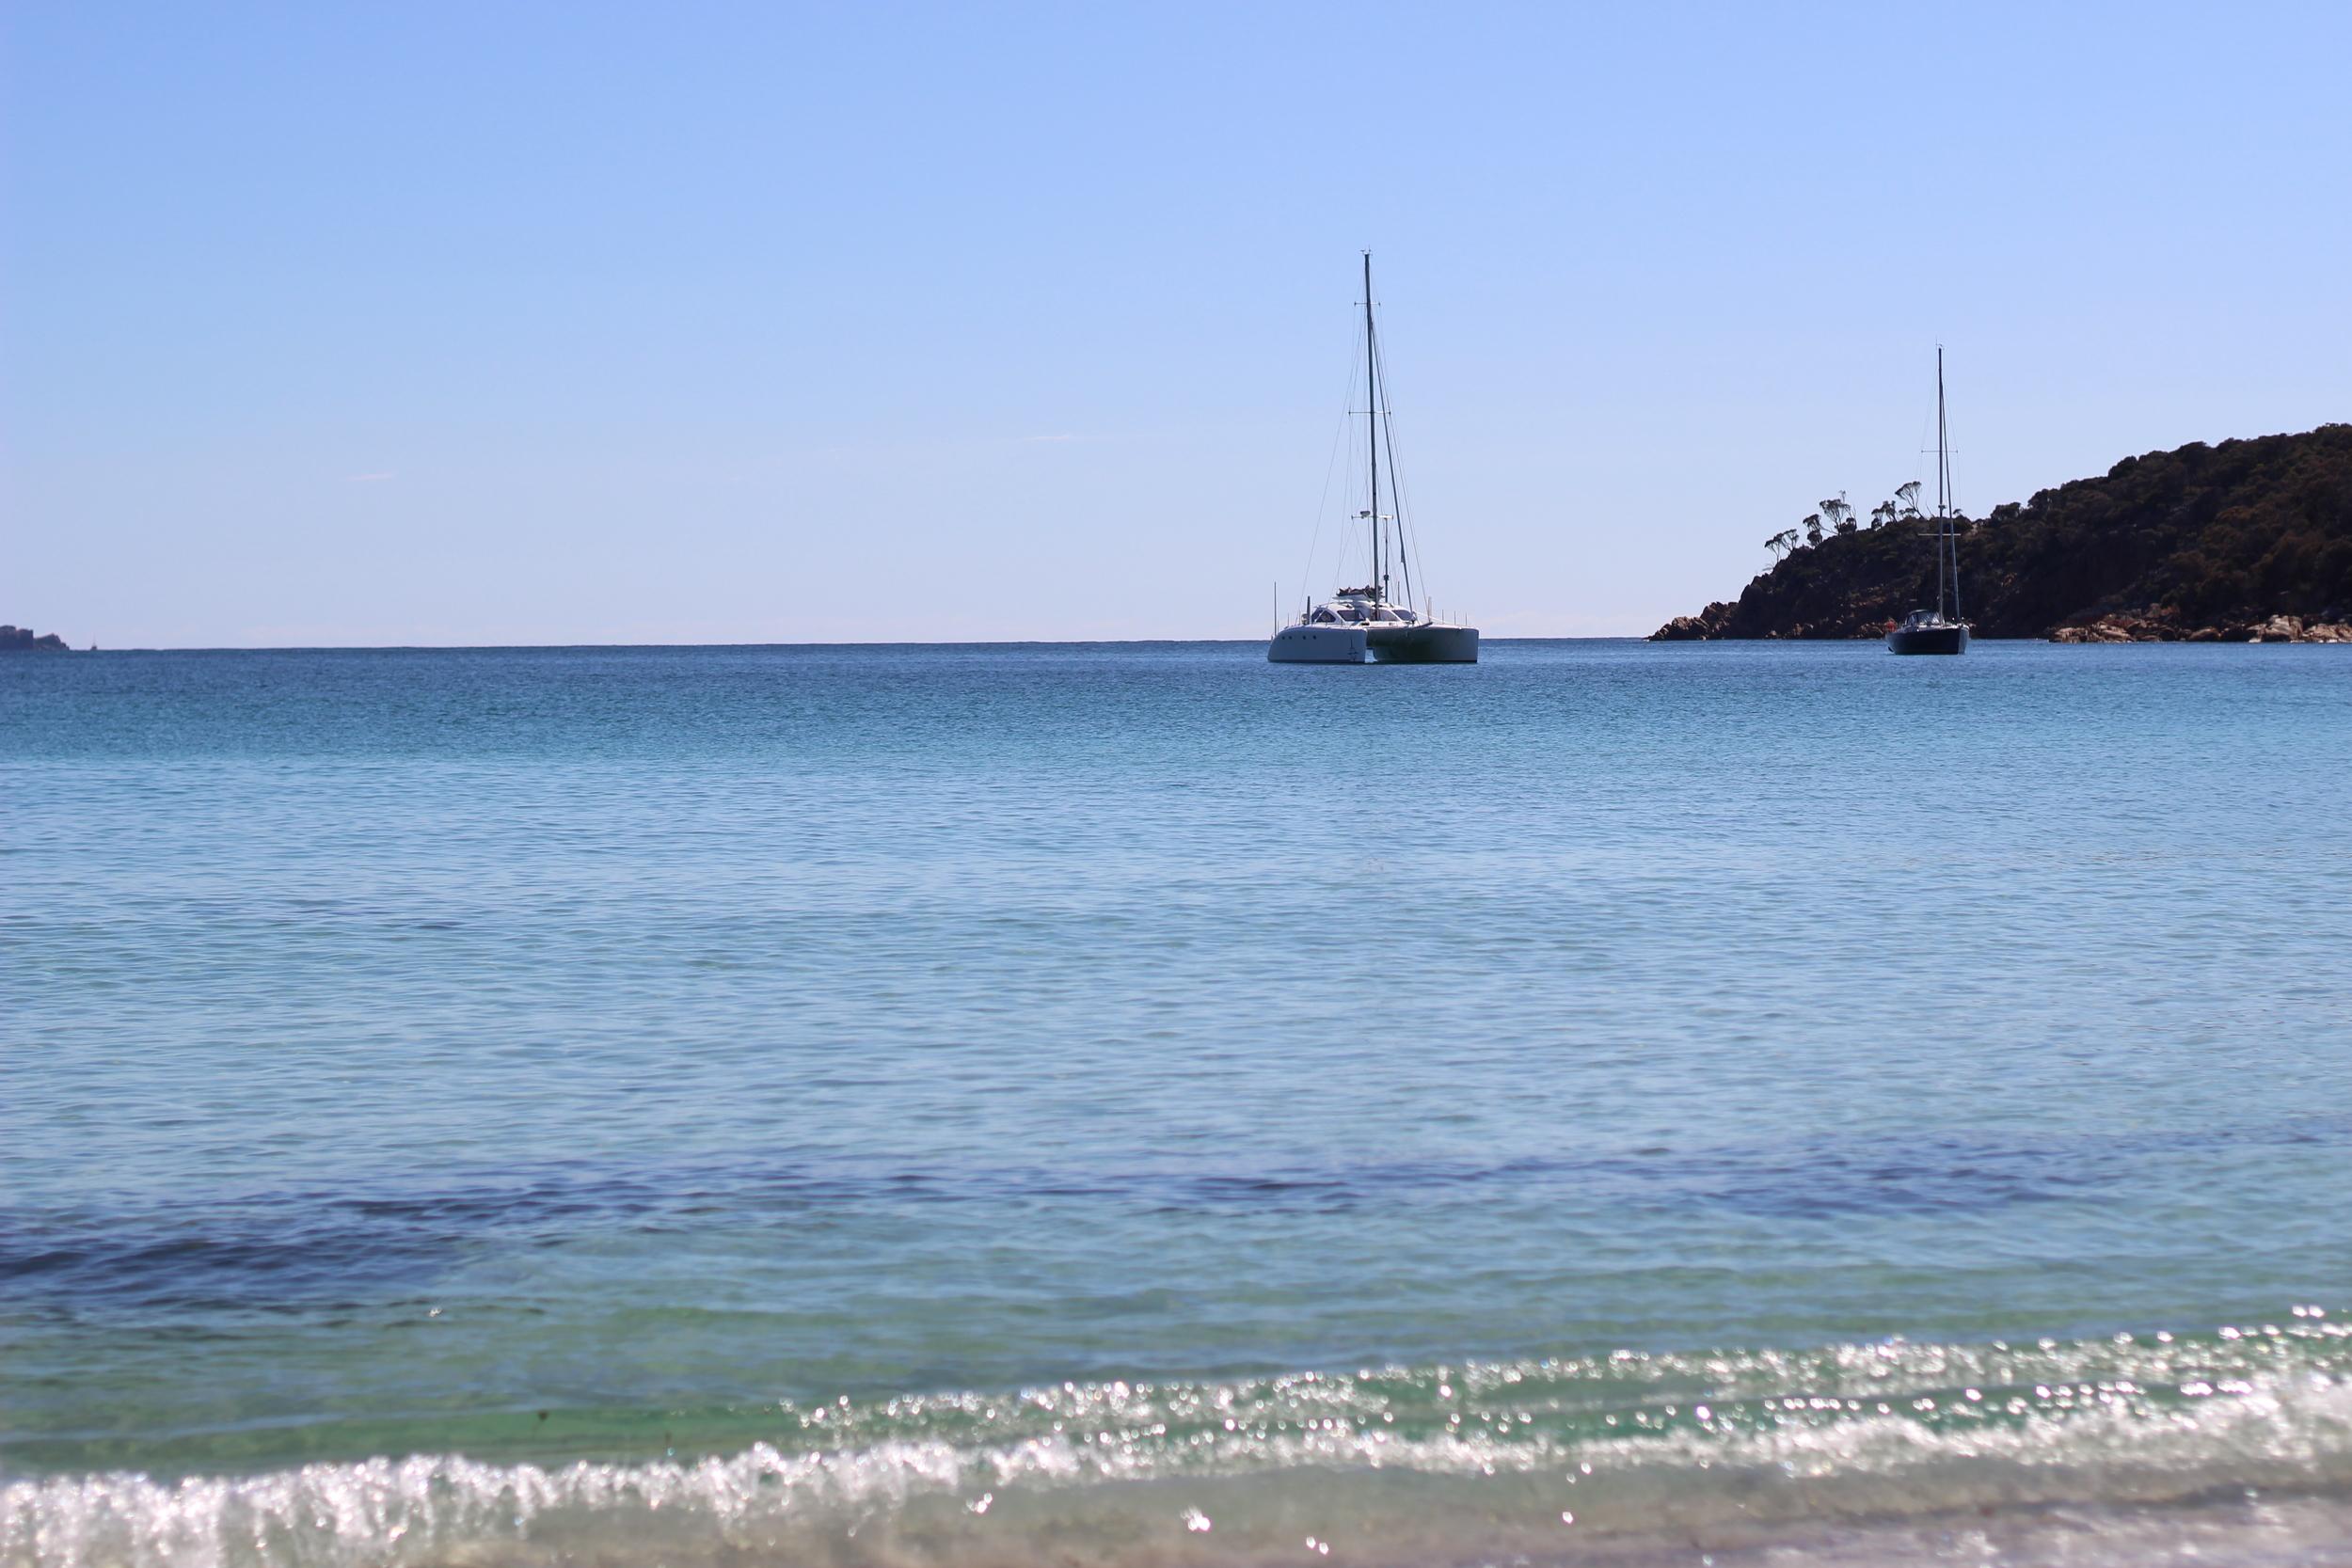 Roam anchored in Wine Glass Bay